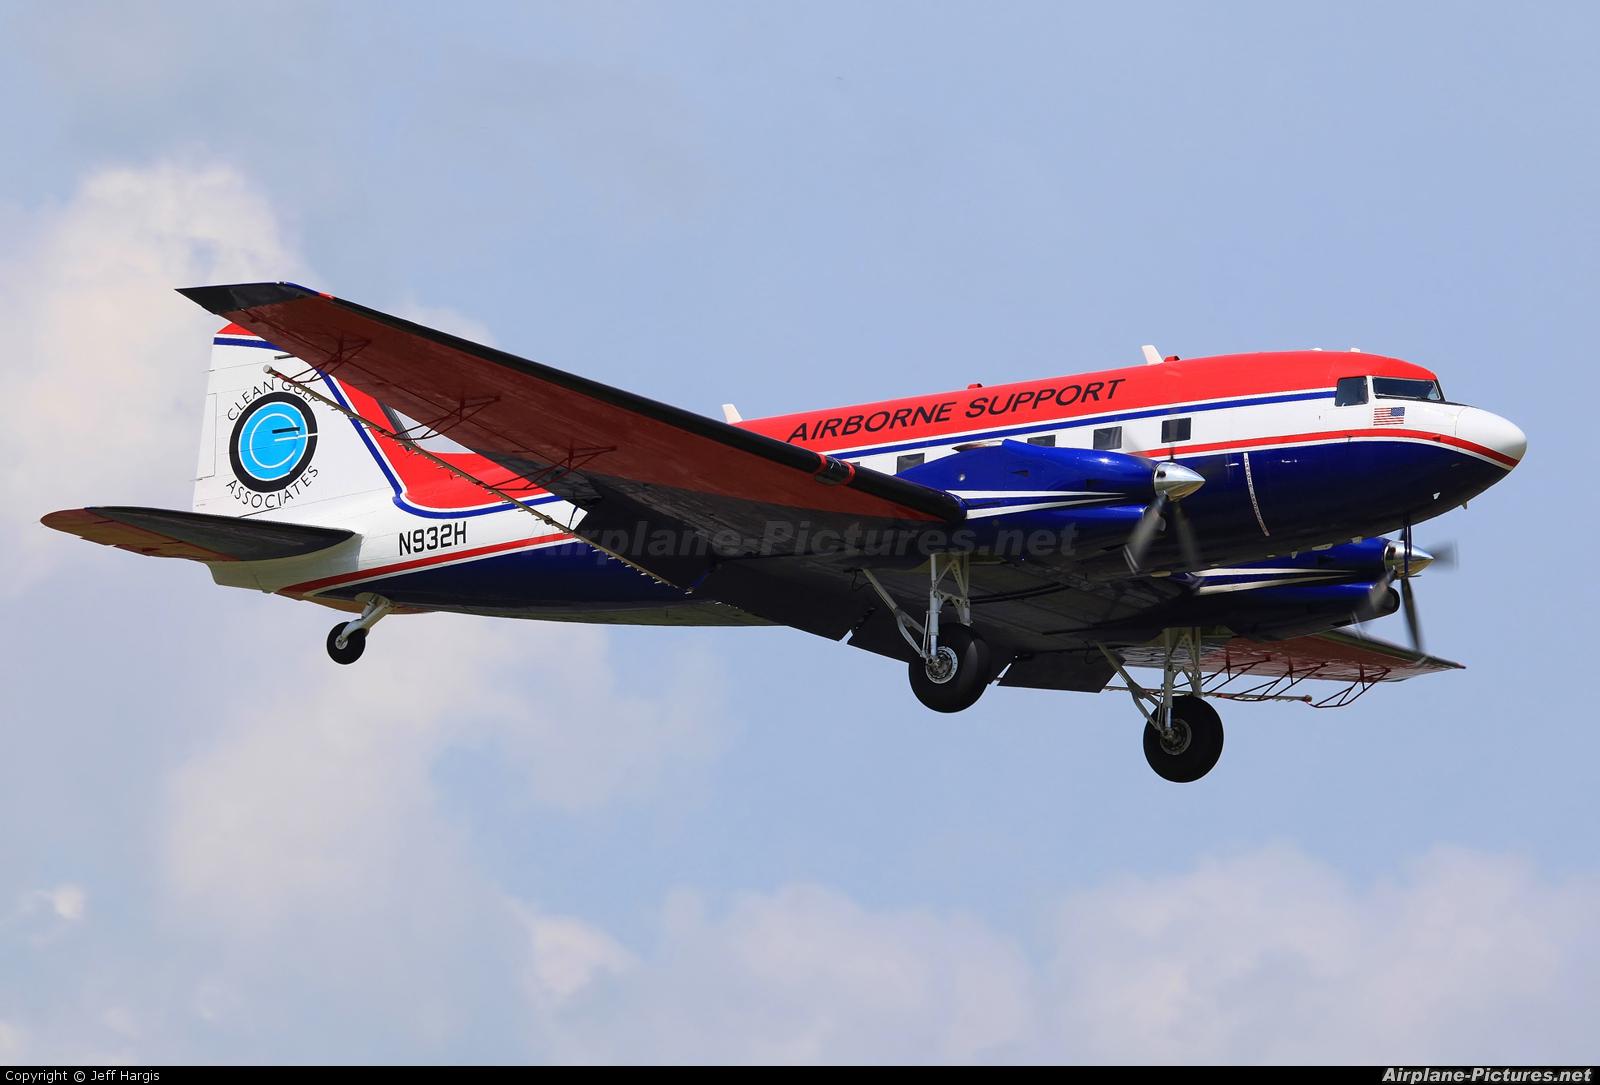 Airborne Support N932H aircraft at Houma - Terrebonne